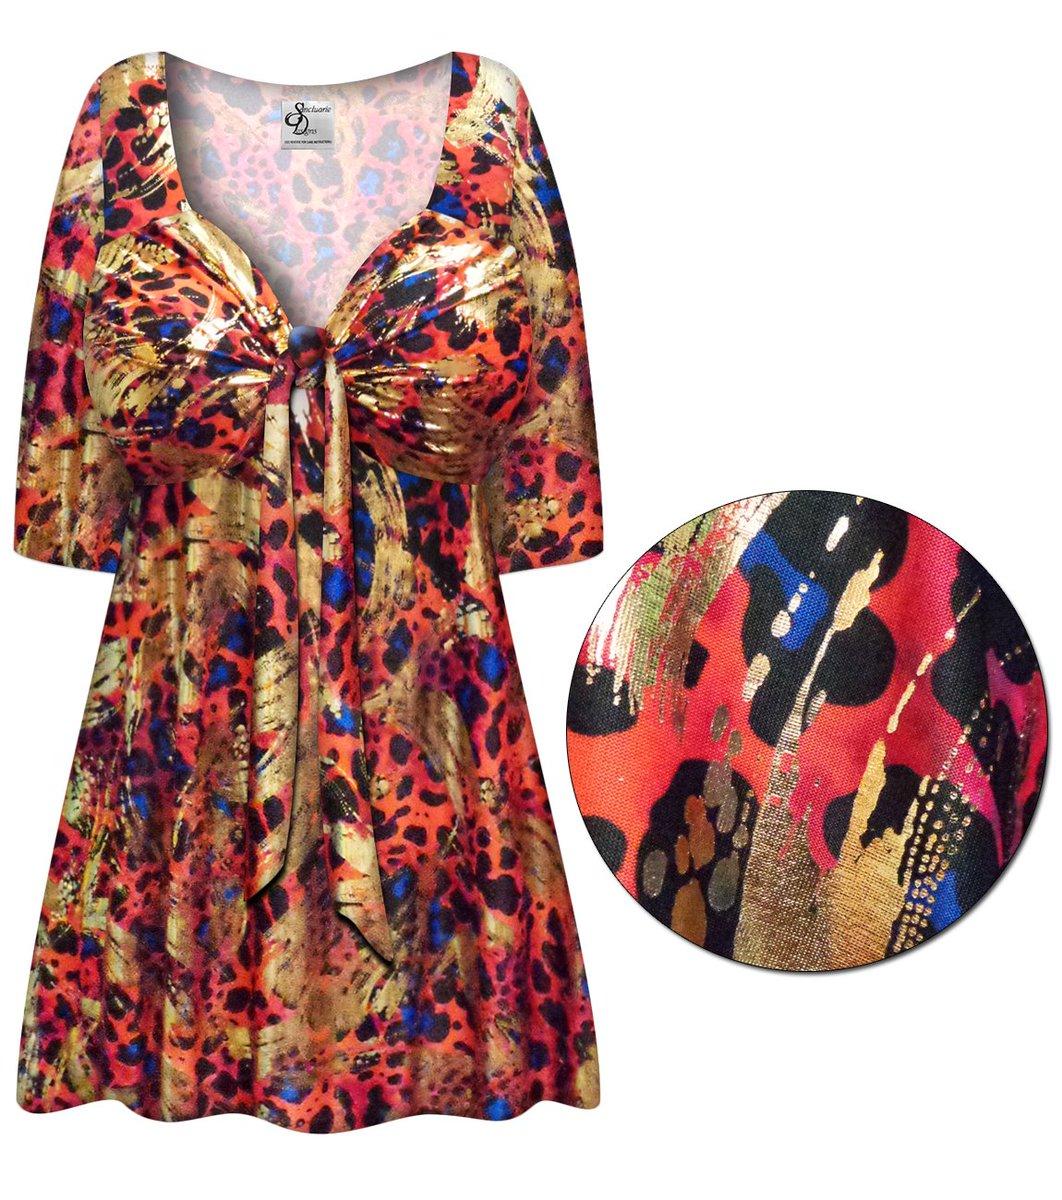 0cca4b4b875 PLUS SIZE Metallic Red Black and Blue Slinky Tie Babydoll Shirt Sizes Lg XL  1x 2x 3x 4x 5x 6x 7x 8x. https   www.sanctuarie.com toptb90401593.html … ...